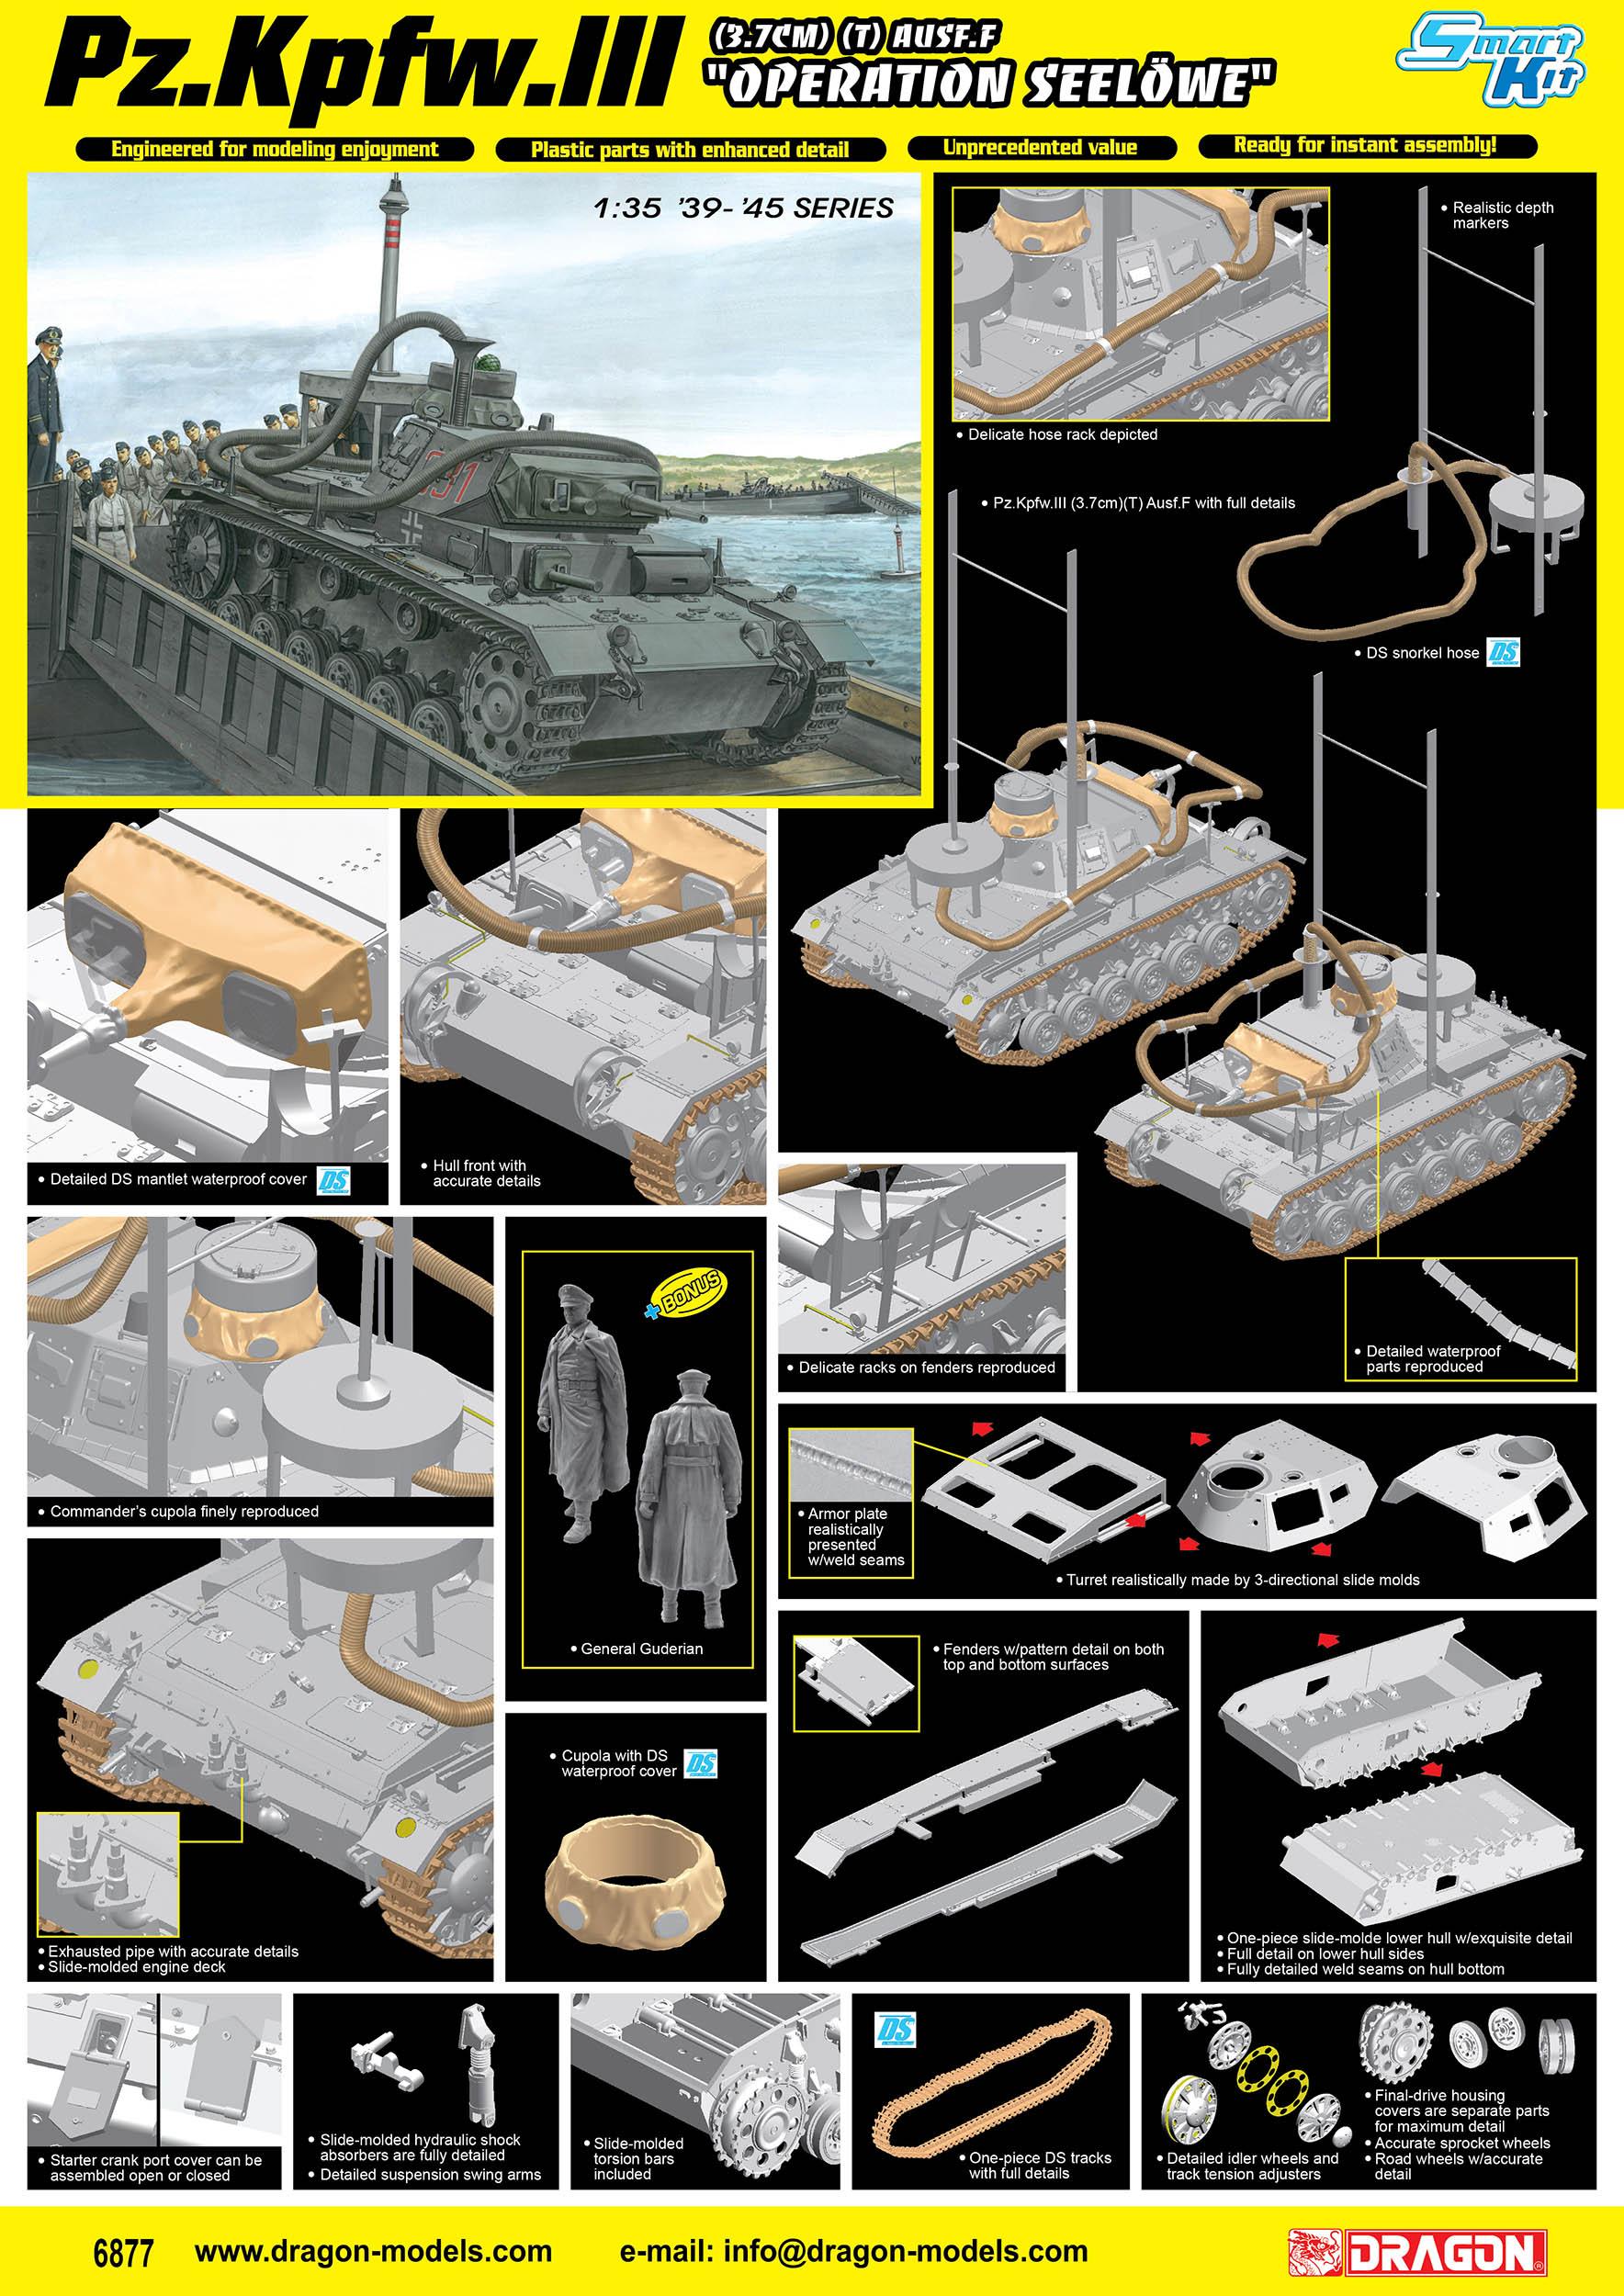 New Releases in Dragon Plastic Model Kits